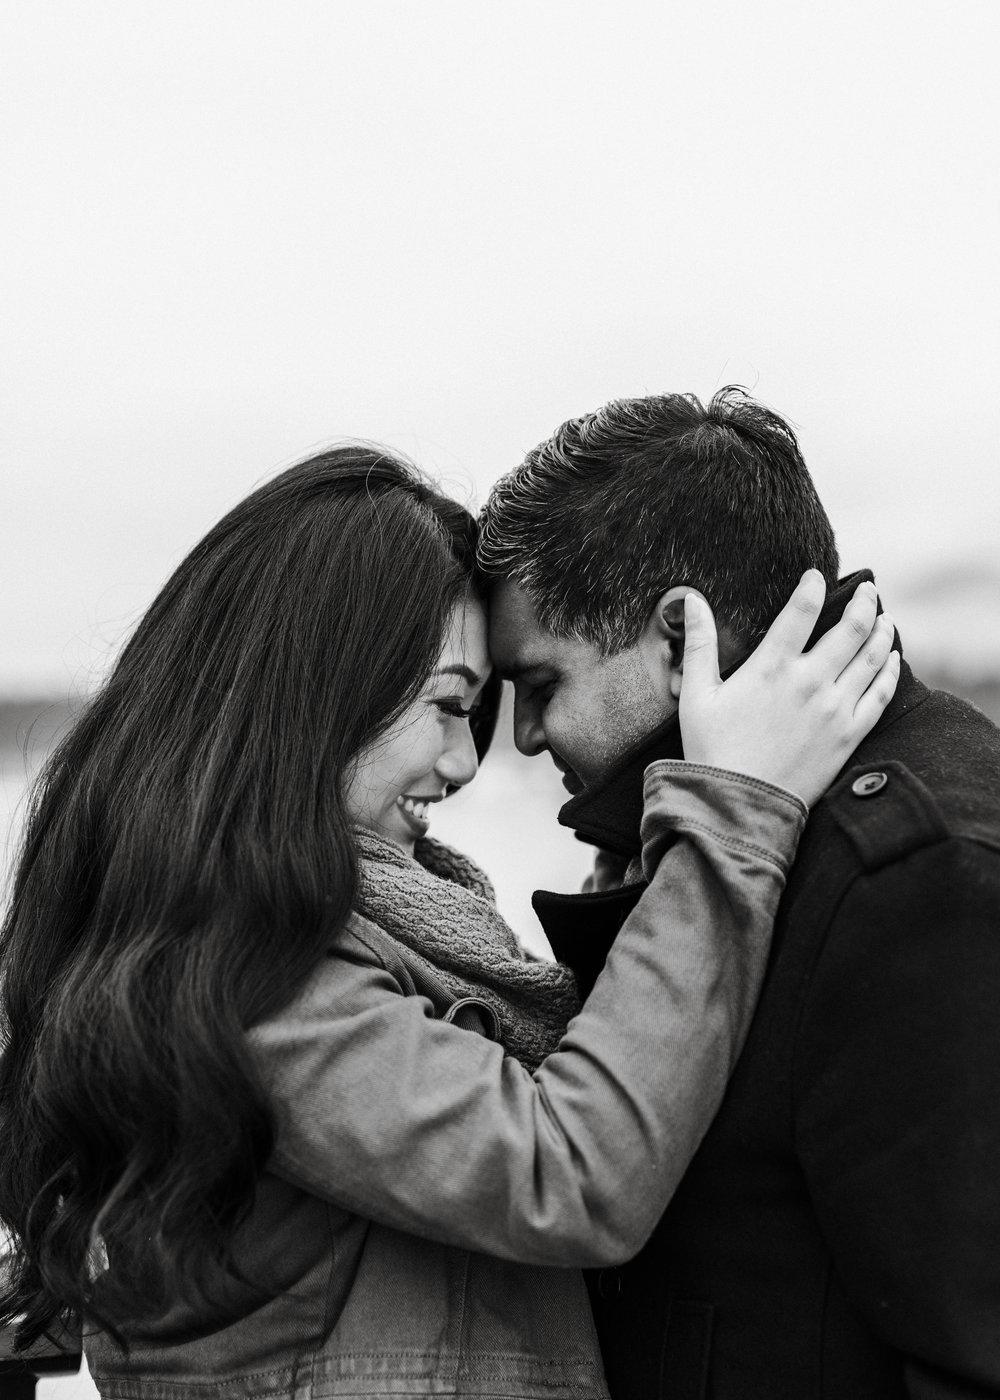 HeraStudios_Selects_Full_JuliaAndrew_Engagement-85.jpg